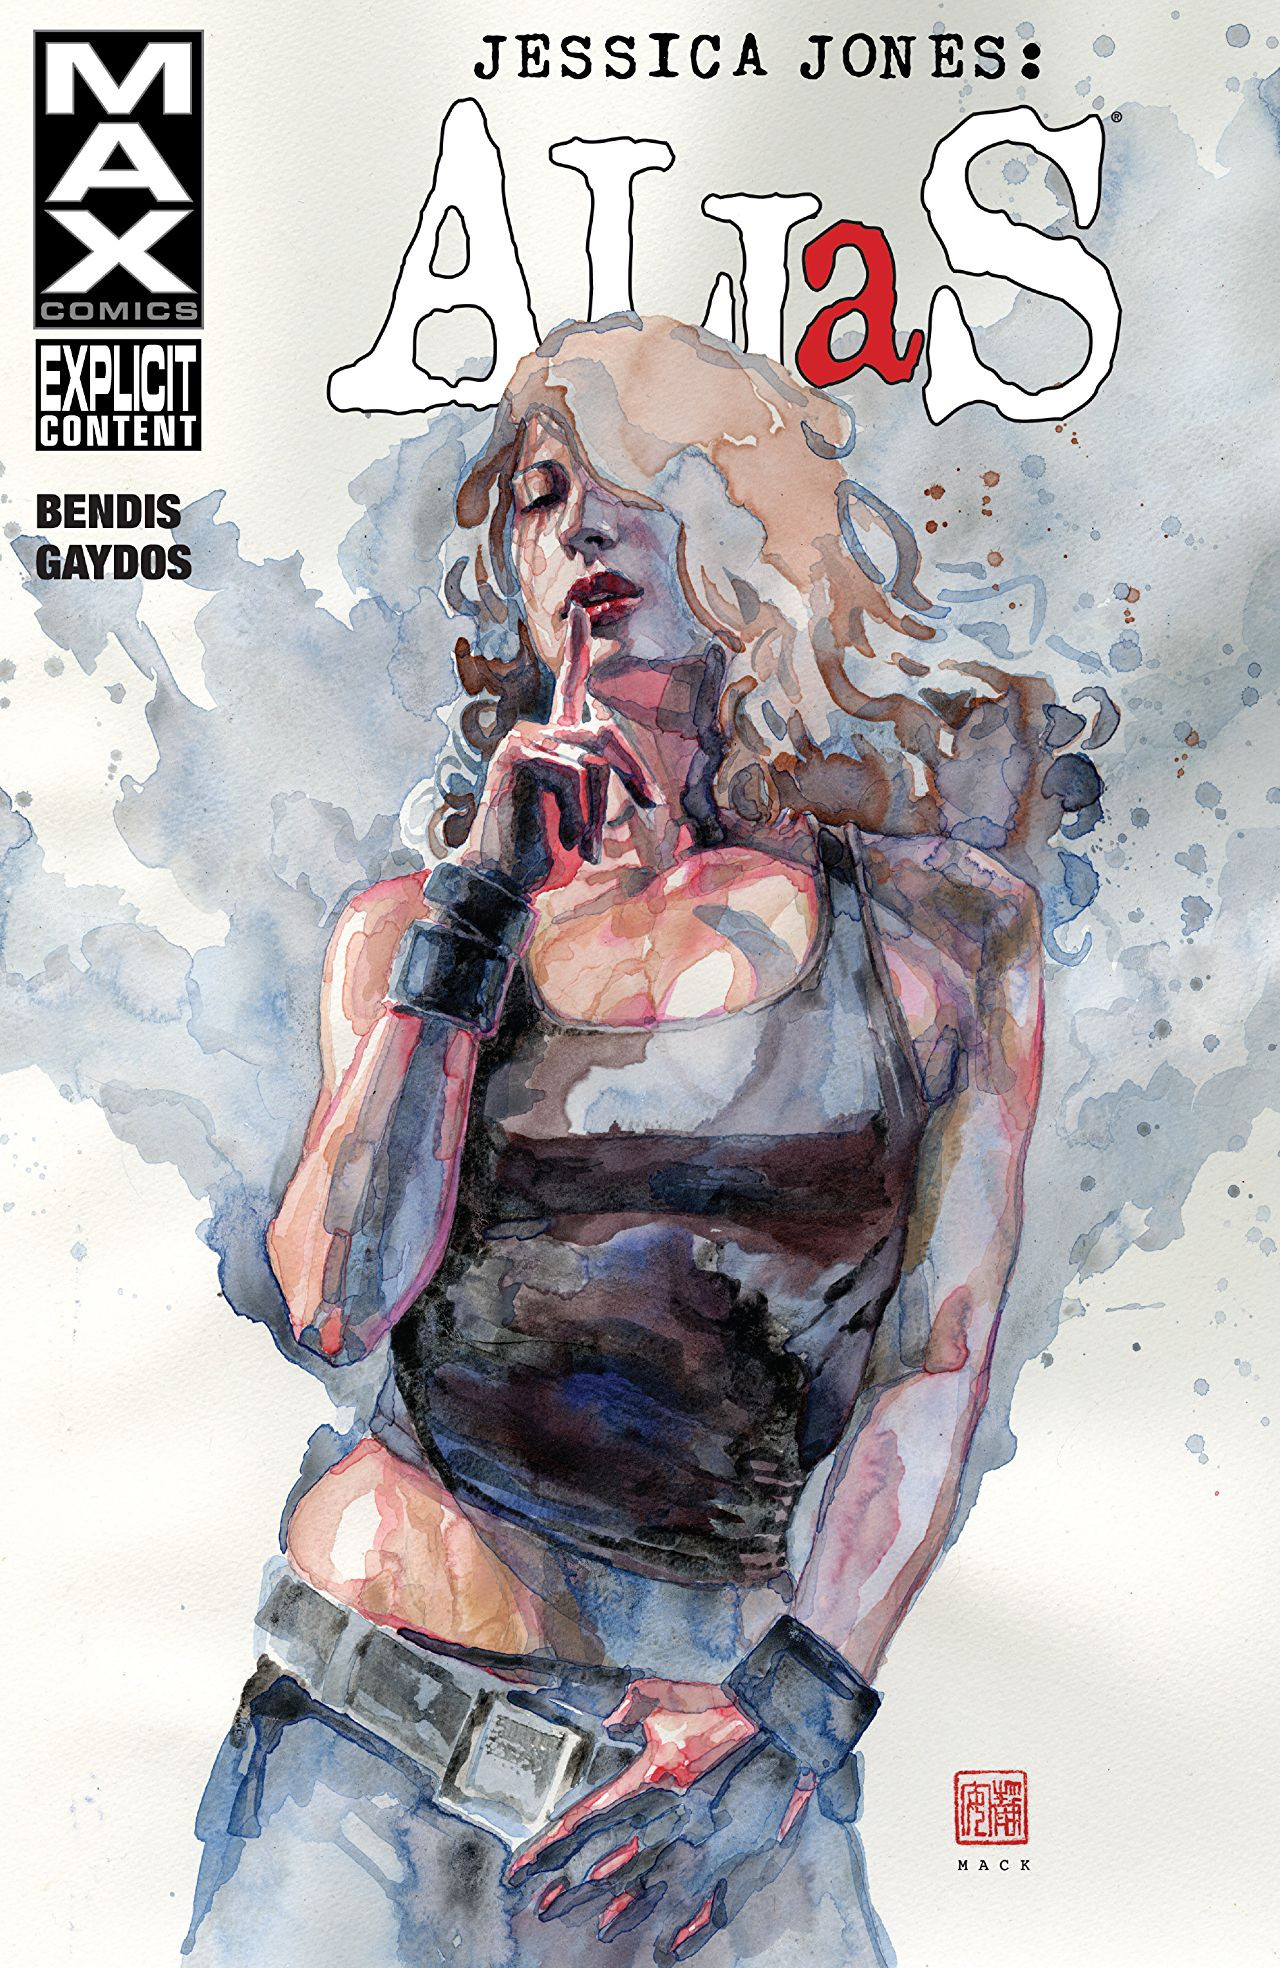 Jessica Jones: Alias TPB Vol 1 3